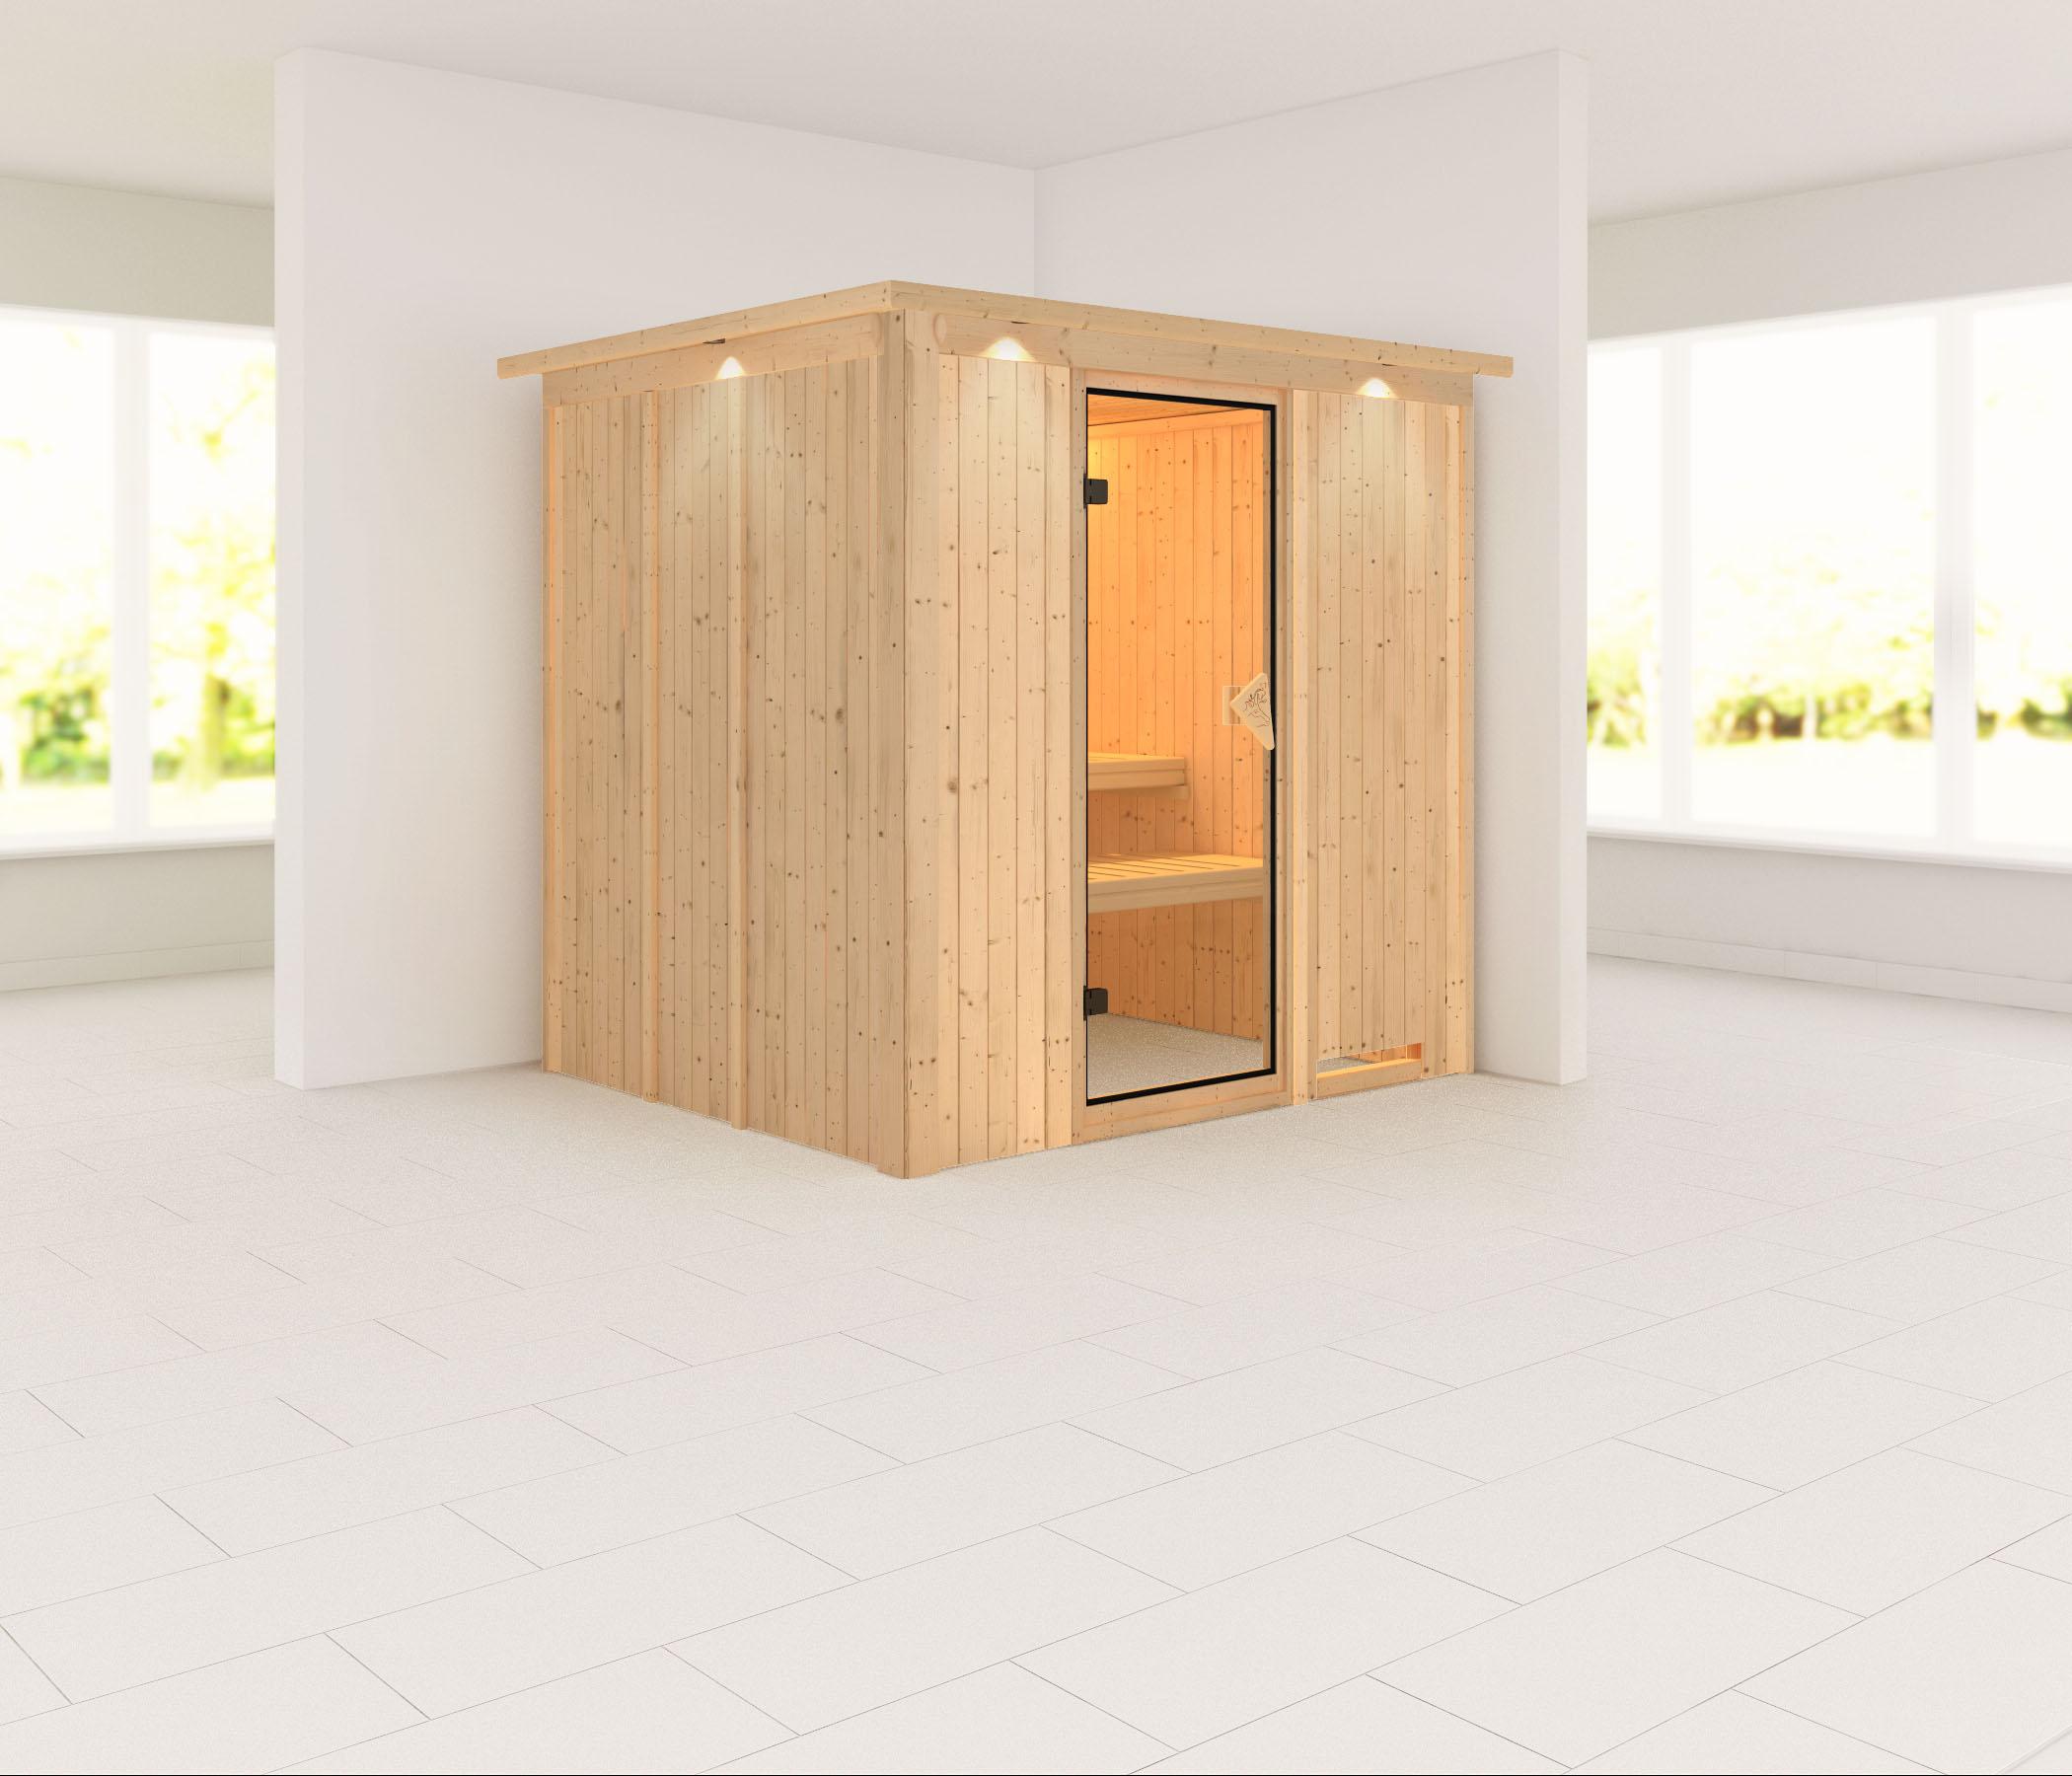 karibu sauna daria welche sauna kaufen. Black Bedroom Furniture Sets. Home Design Ideas